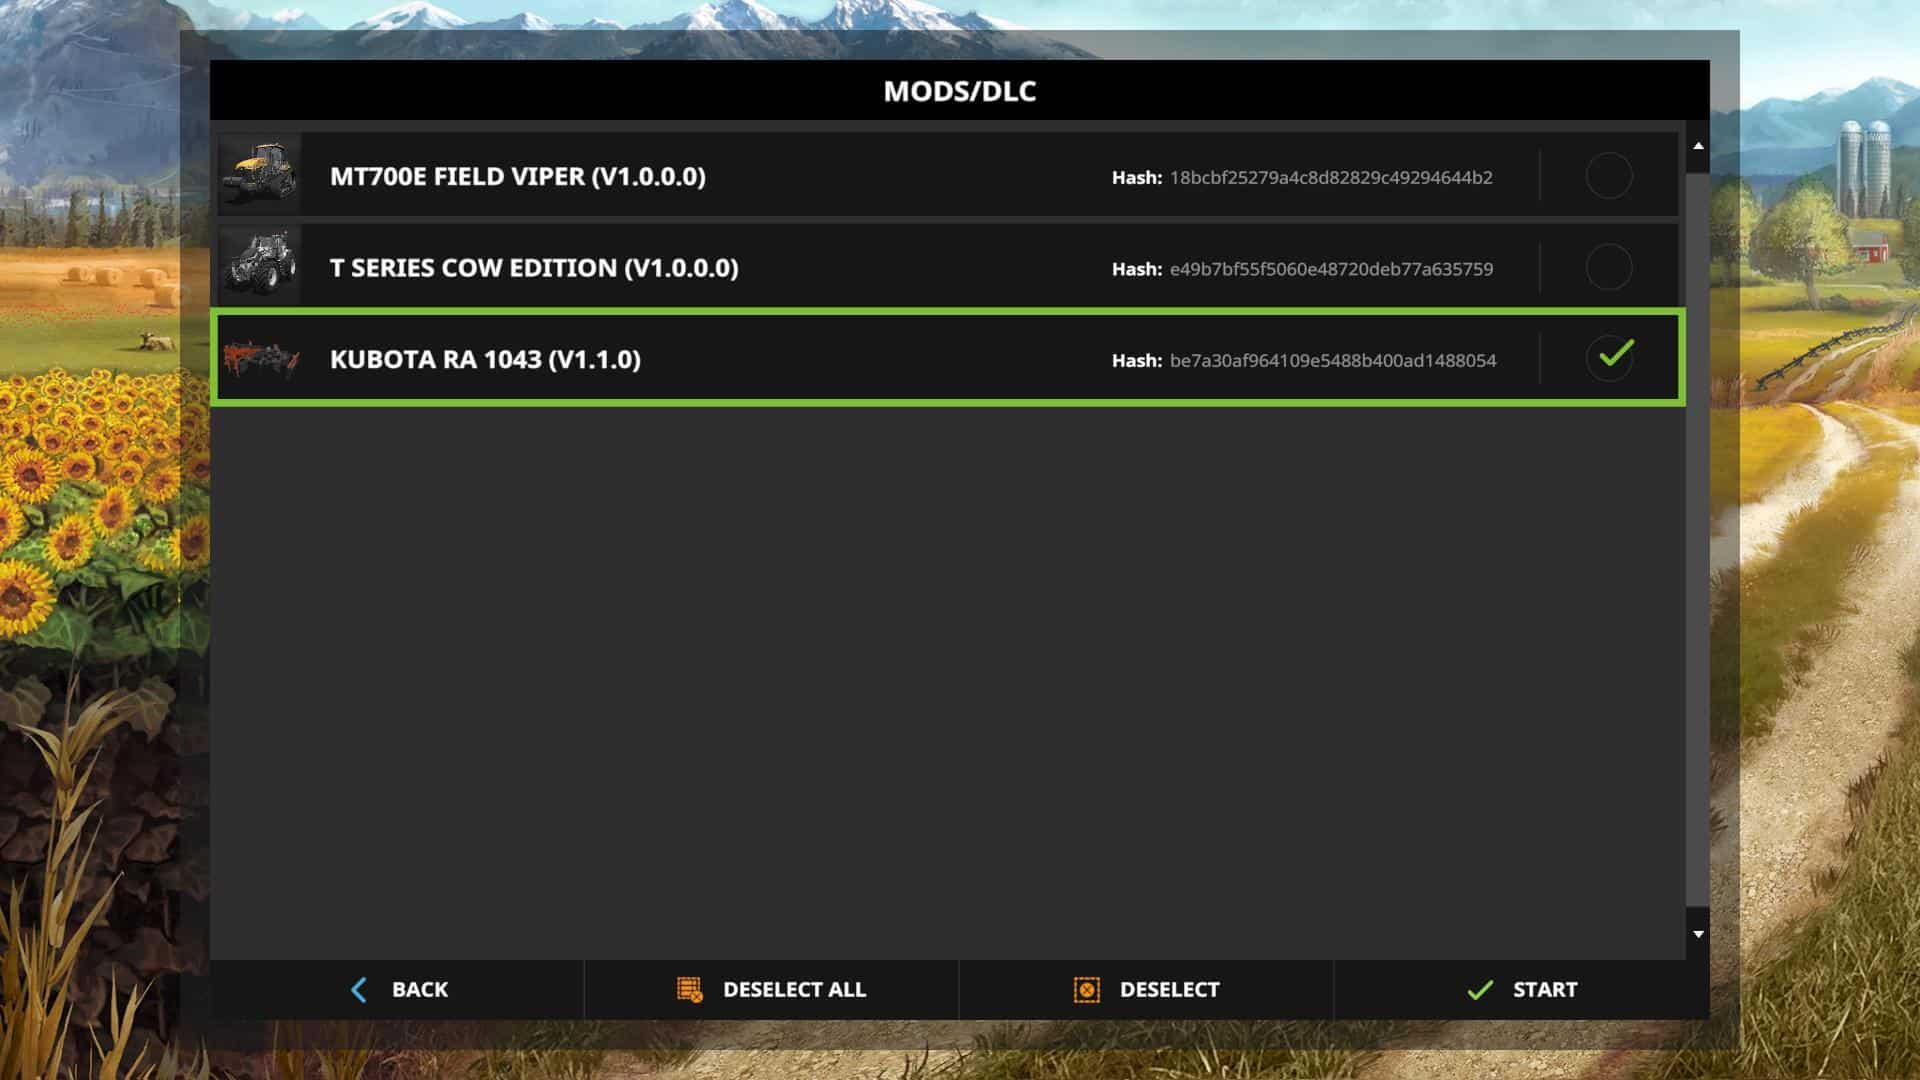 Kubota RA 1043 v1.1.0